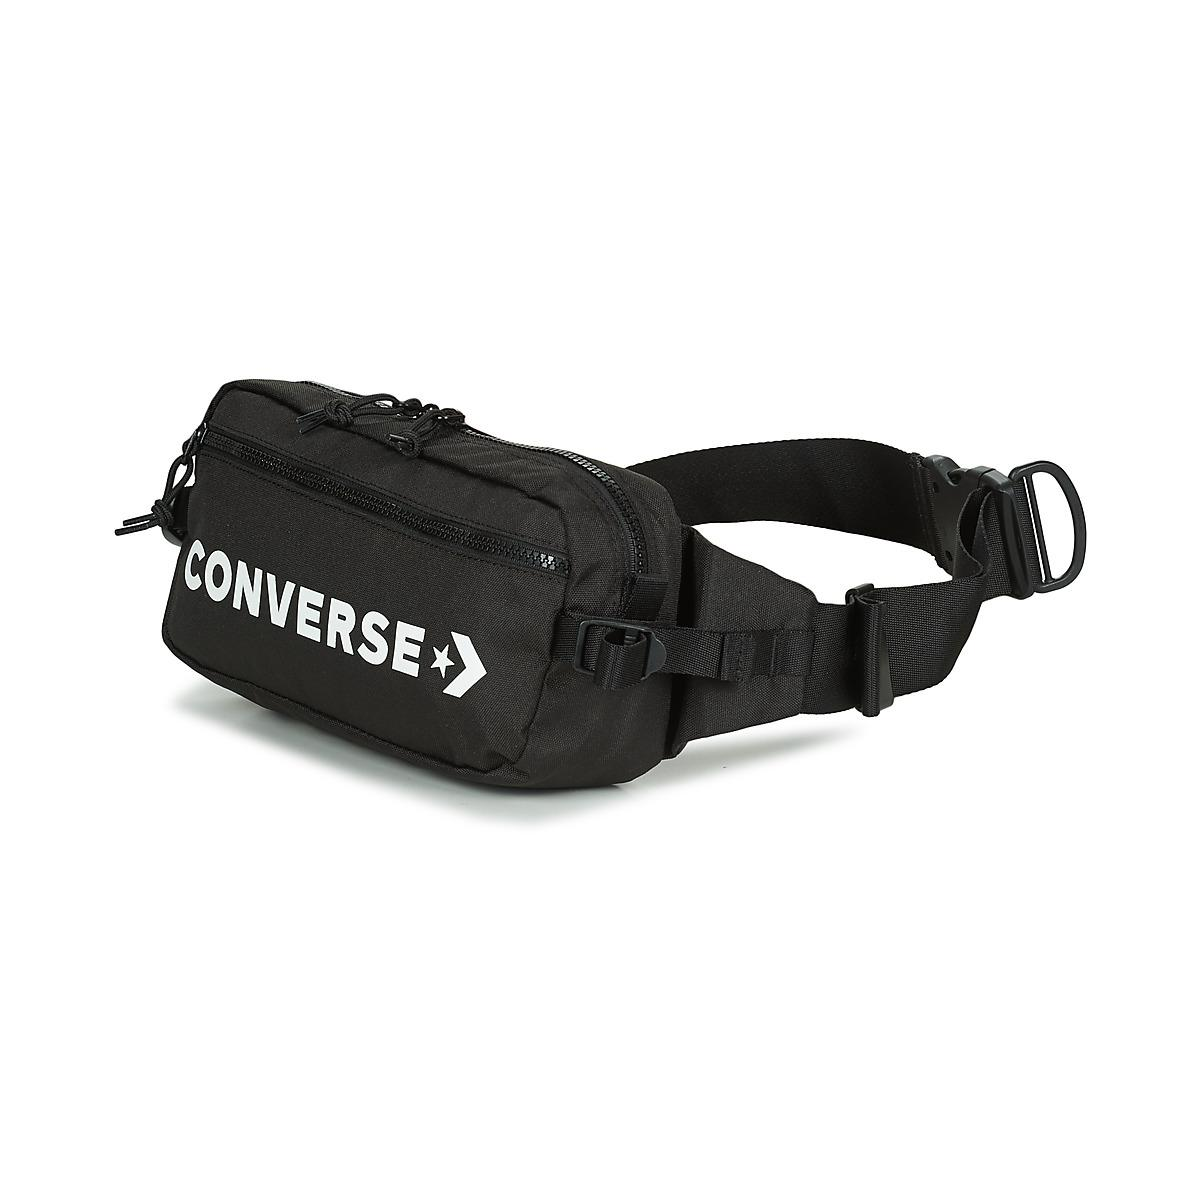 b57e1c1f75ed Converse - Fast Pack Cross Body Men s Hip Bag In Black for Men - Lyst. View  fullscreen